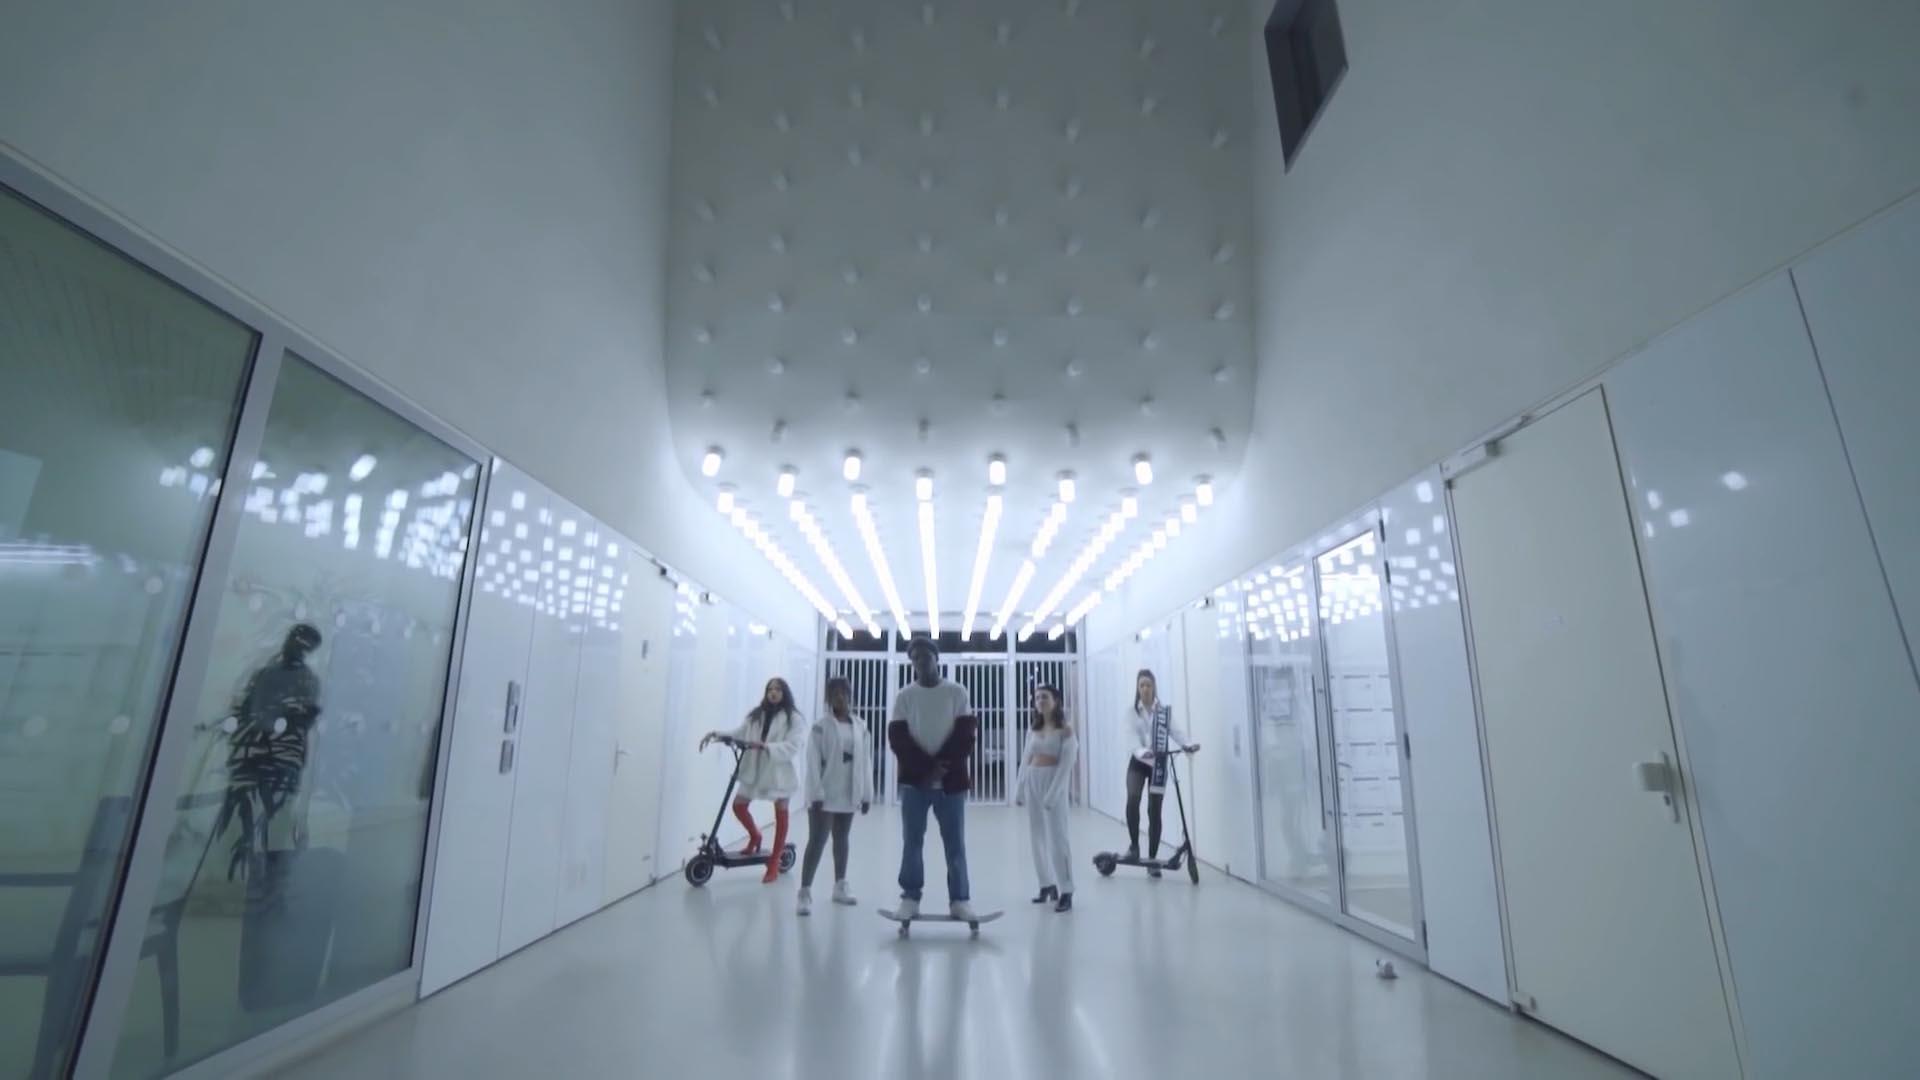 Picture of Yellam's music video, by Perimetre creative studio based in Paris